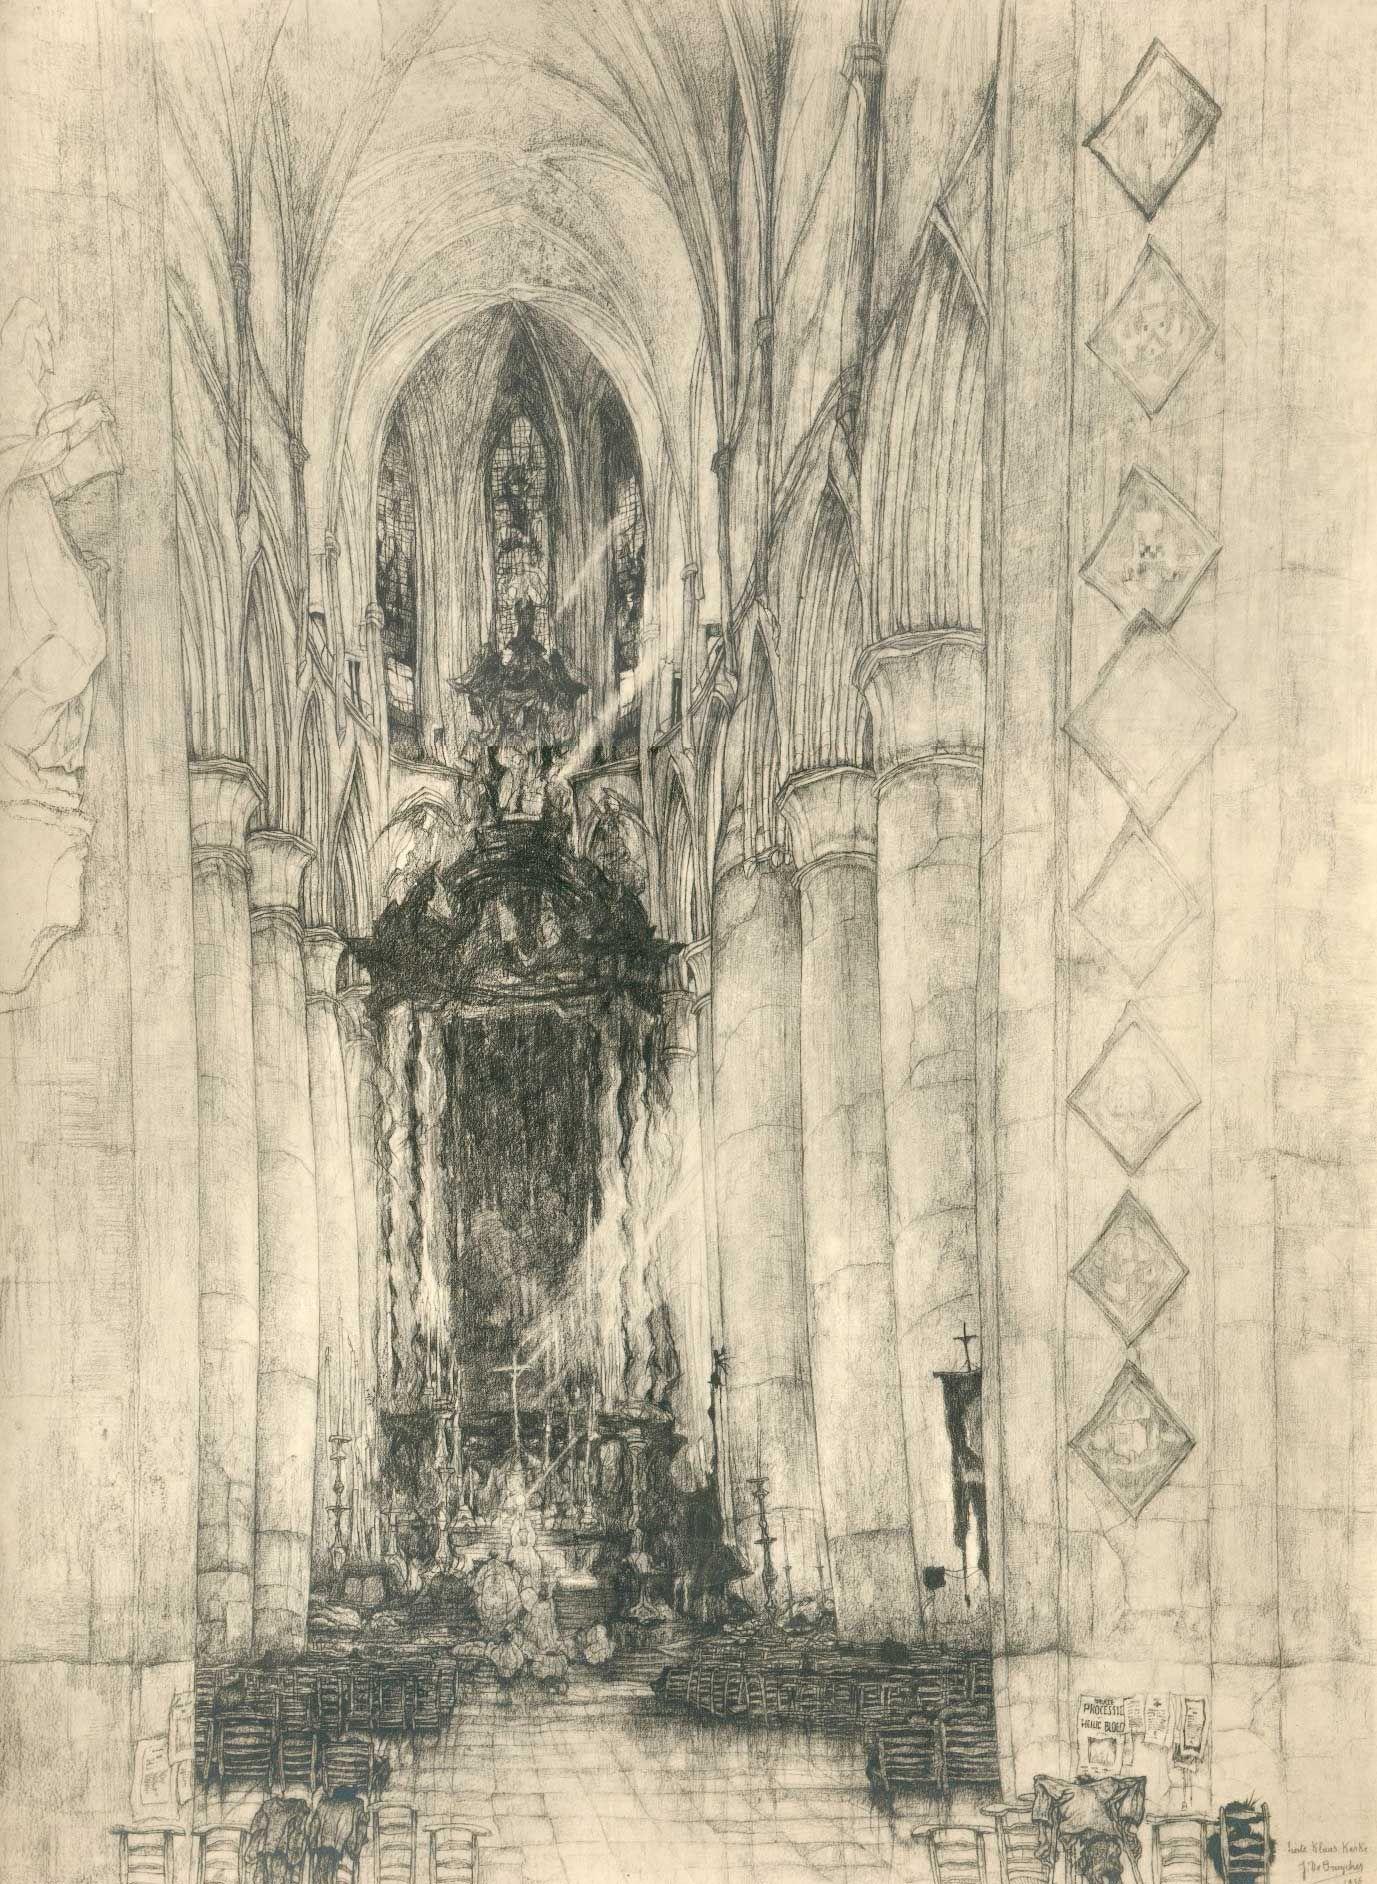 Jules de Bruycker